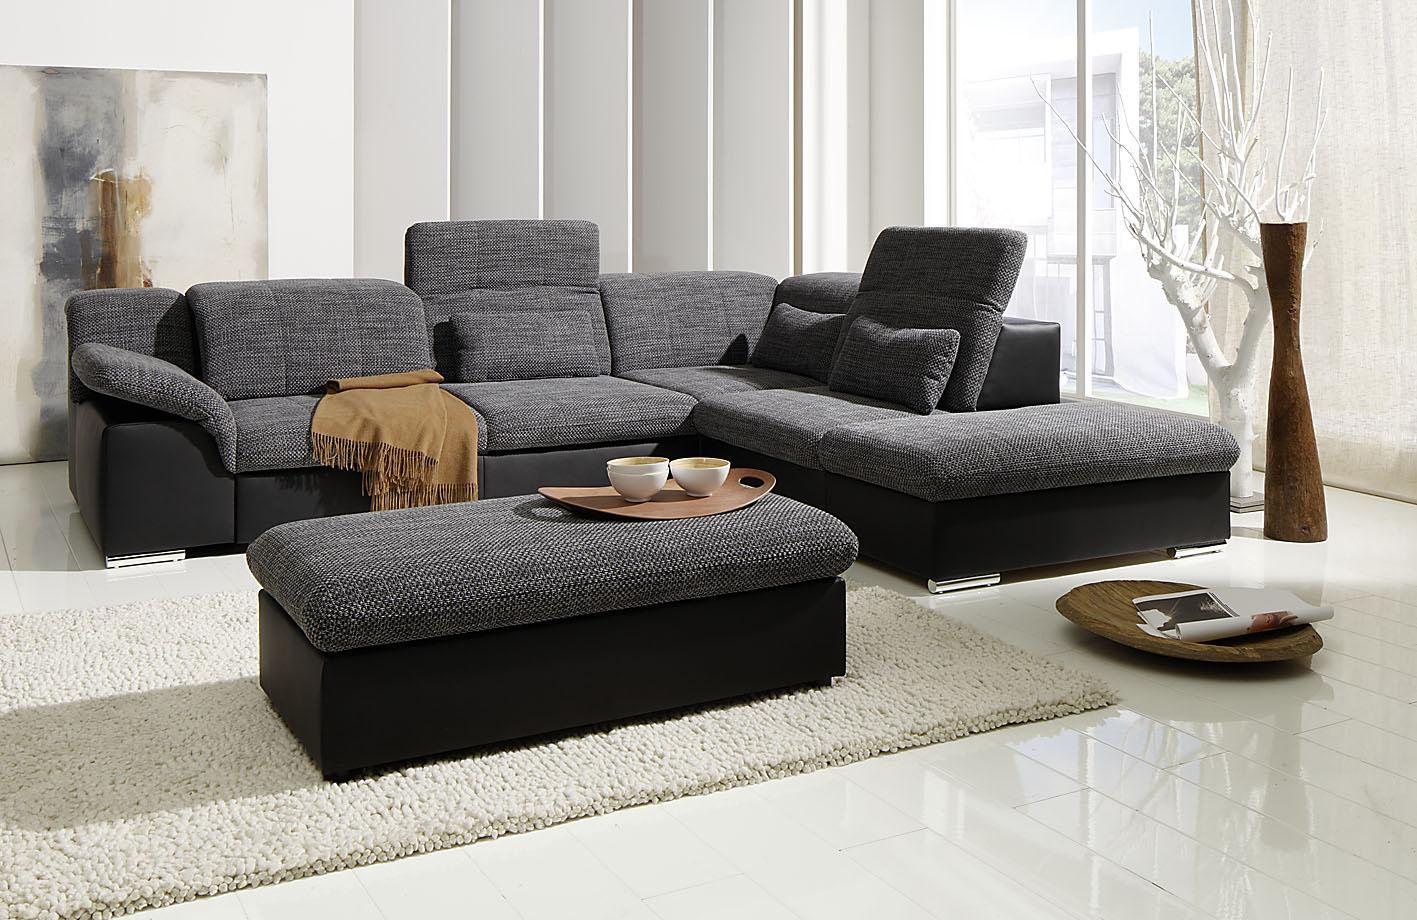 arizona ecksofa eckgarnitur couch sofa lederoptik eckcouch wohnlandschaft. Black Bedroom Furniture Sets. Home Design Ideas